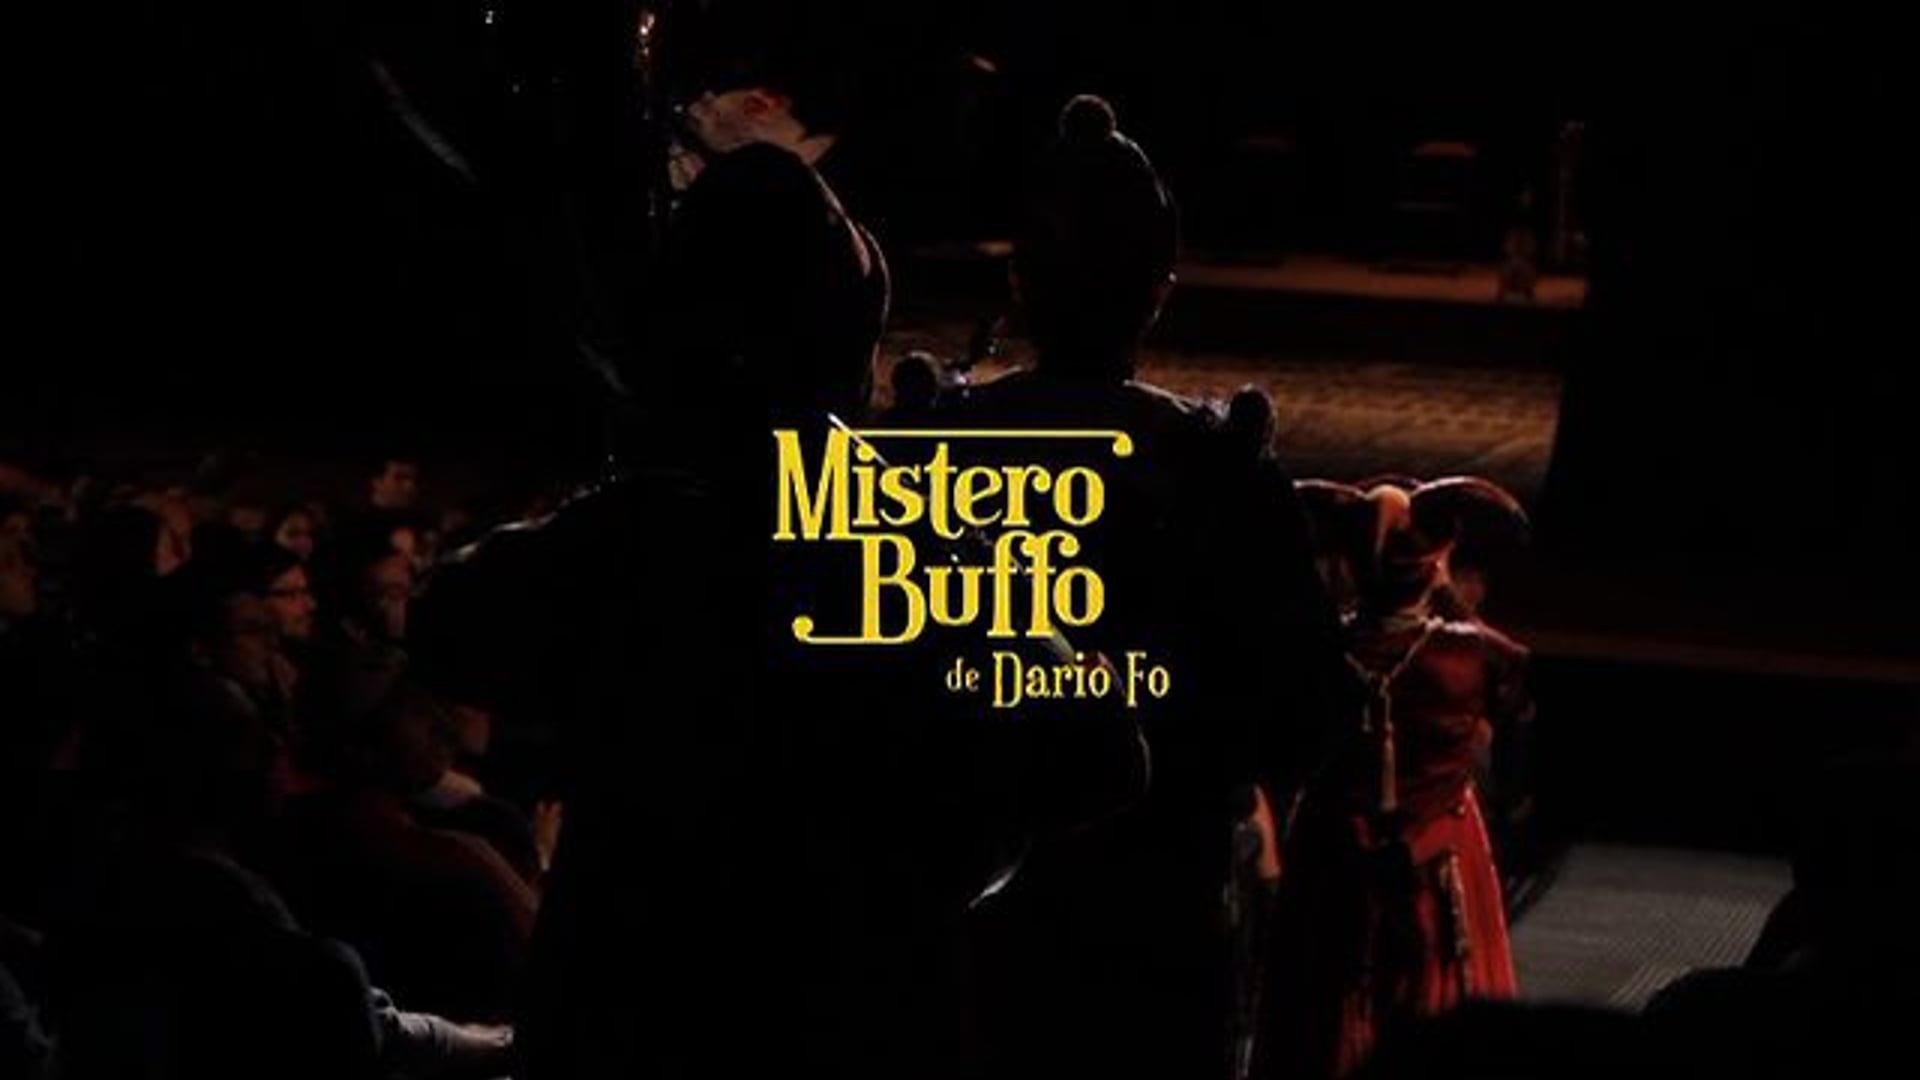 MISTERO BUFFO - La Minima